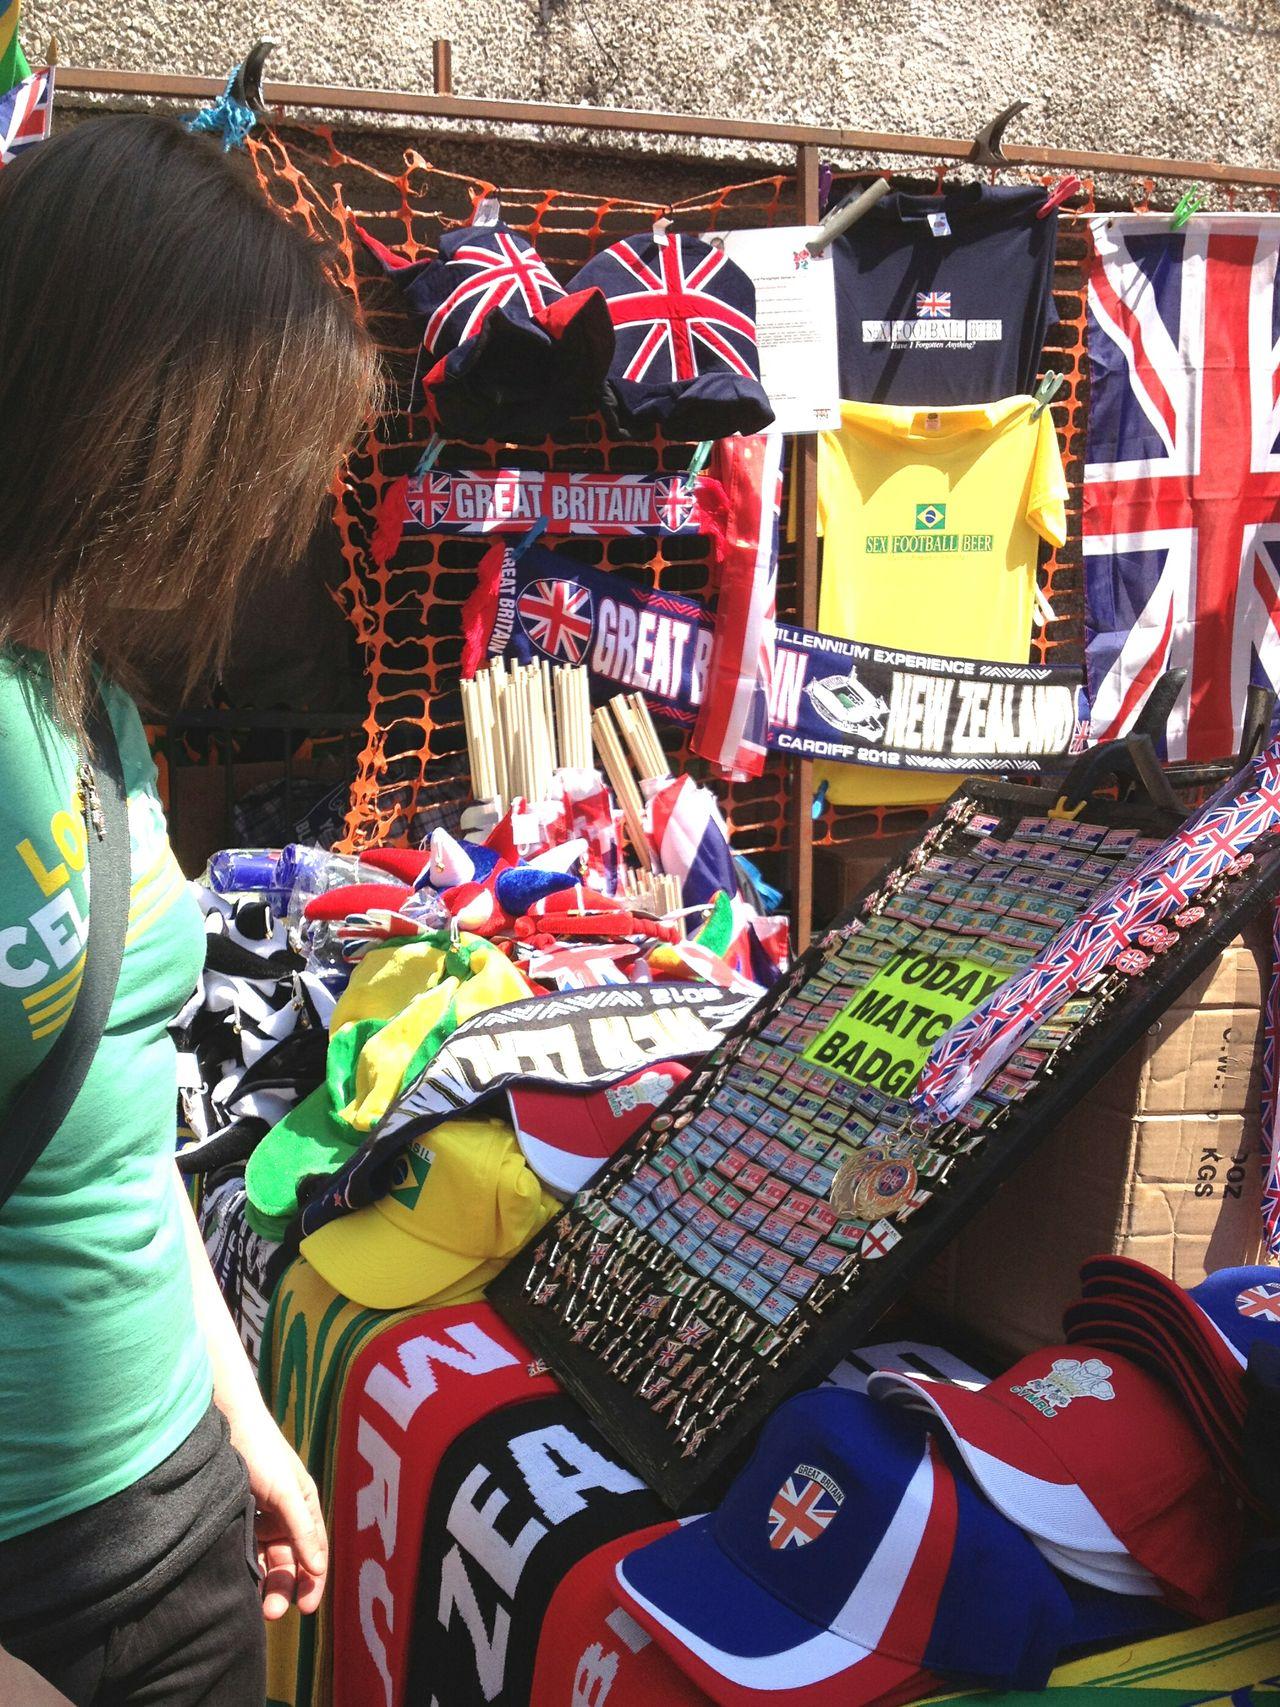 Shopping Street Market Sports Memorabilia Olympics Scarf Pins Hats Union Jack Union Flag